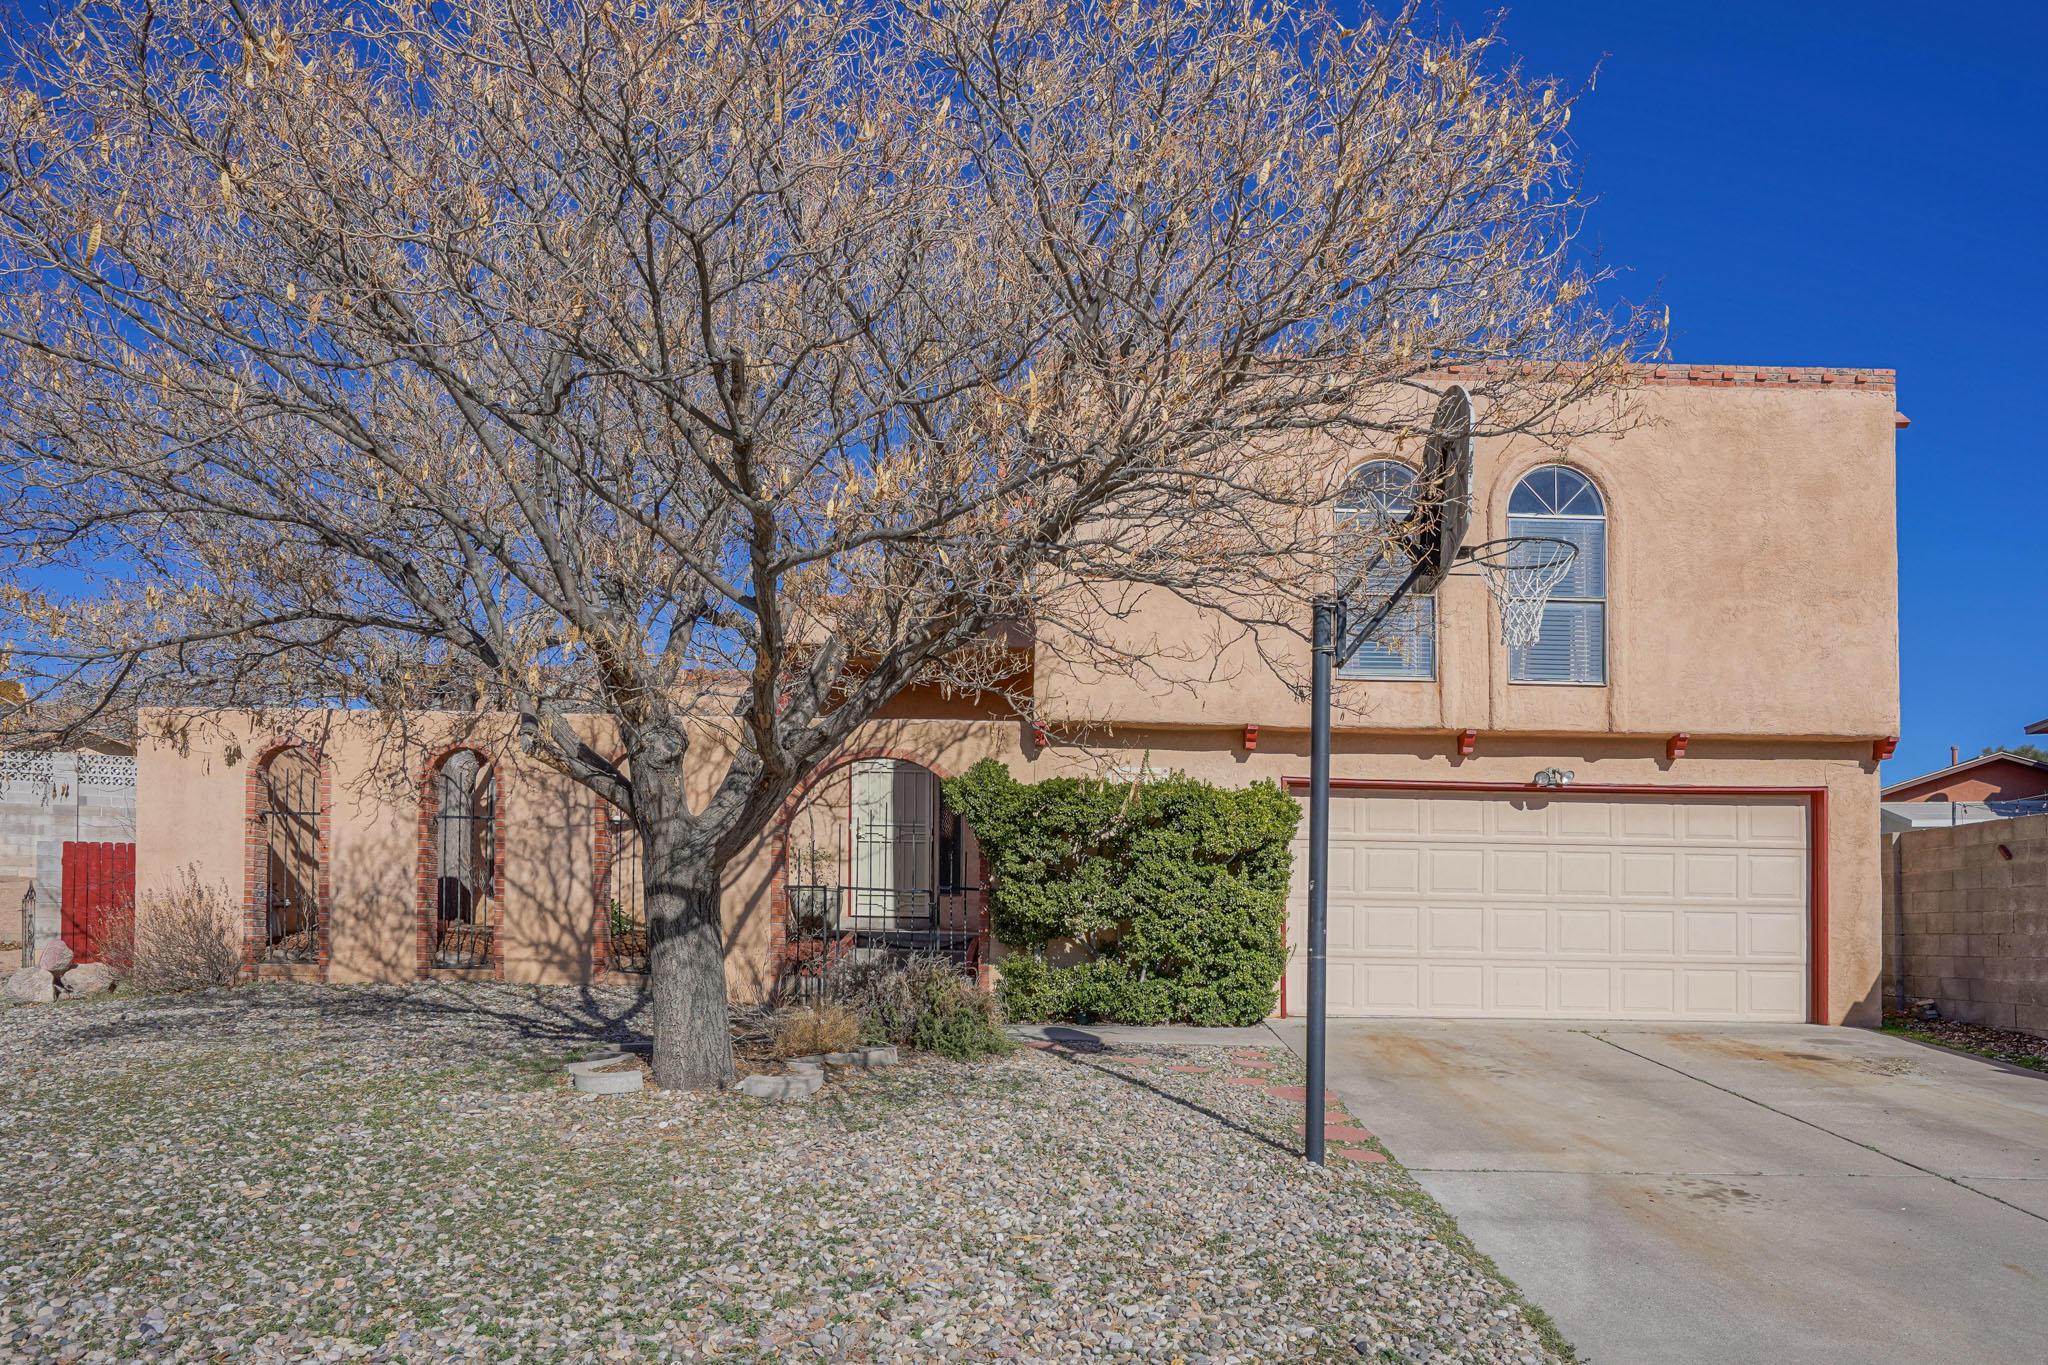 7716 ROBERTS Street NE Property Photo - Albuquerque, NM real estate listing